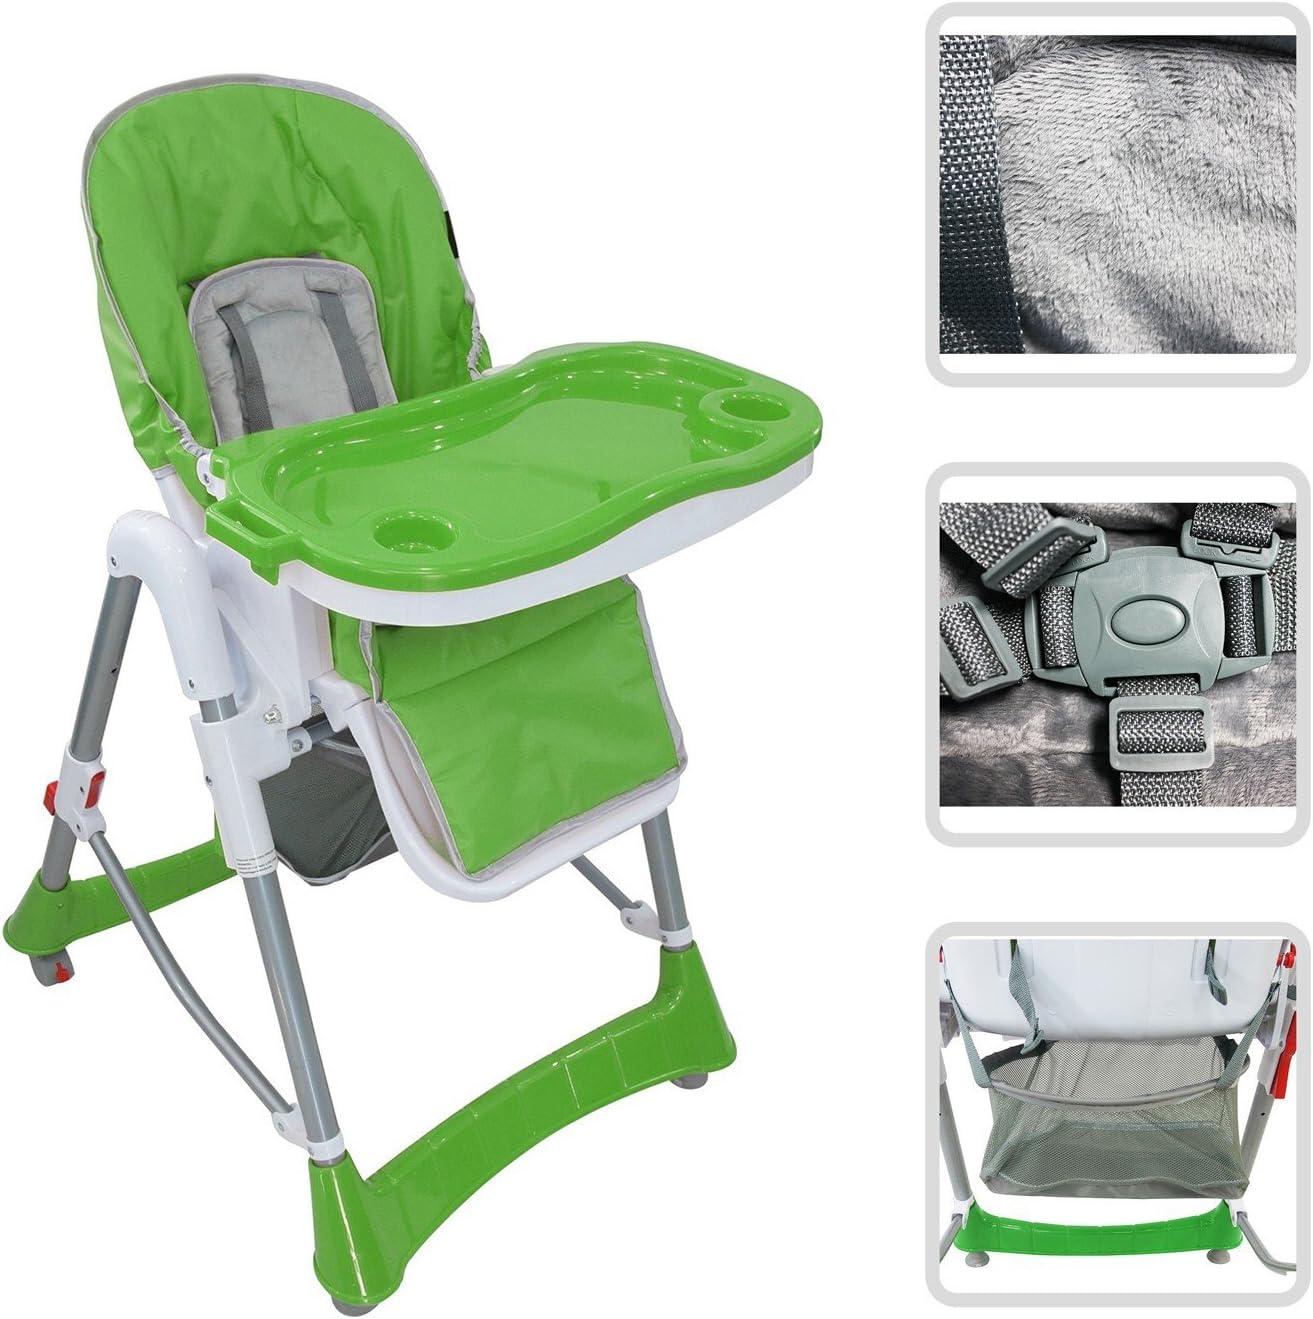 Baby-Klappstuhl Gr/ün Material: PVC Bereitgestellte Gr/ö/ße: 105 x 75 x 60 cm Todeco Baby-Hochstuhl